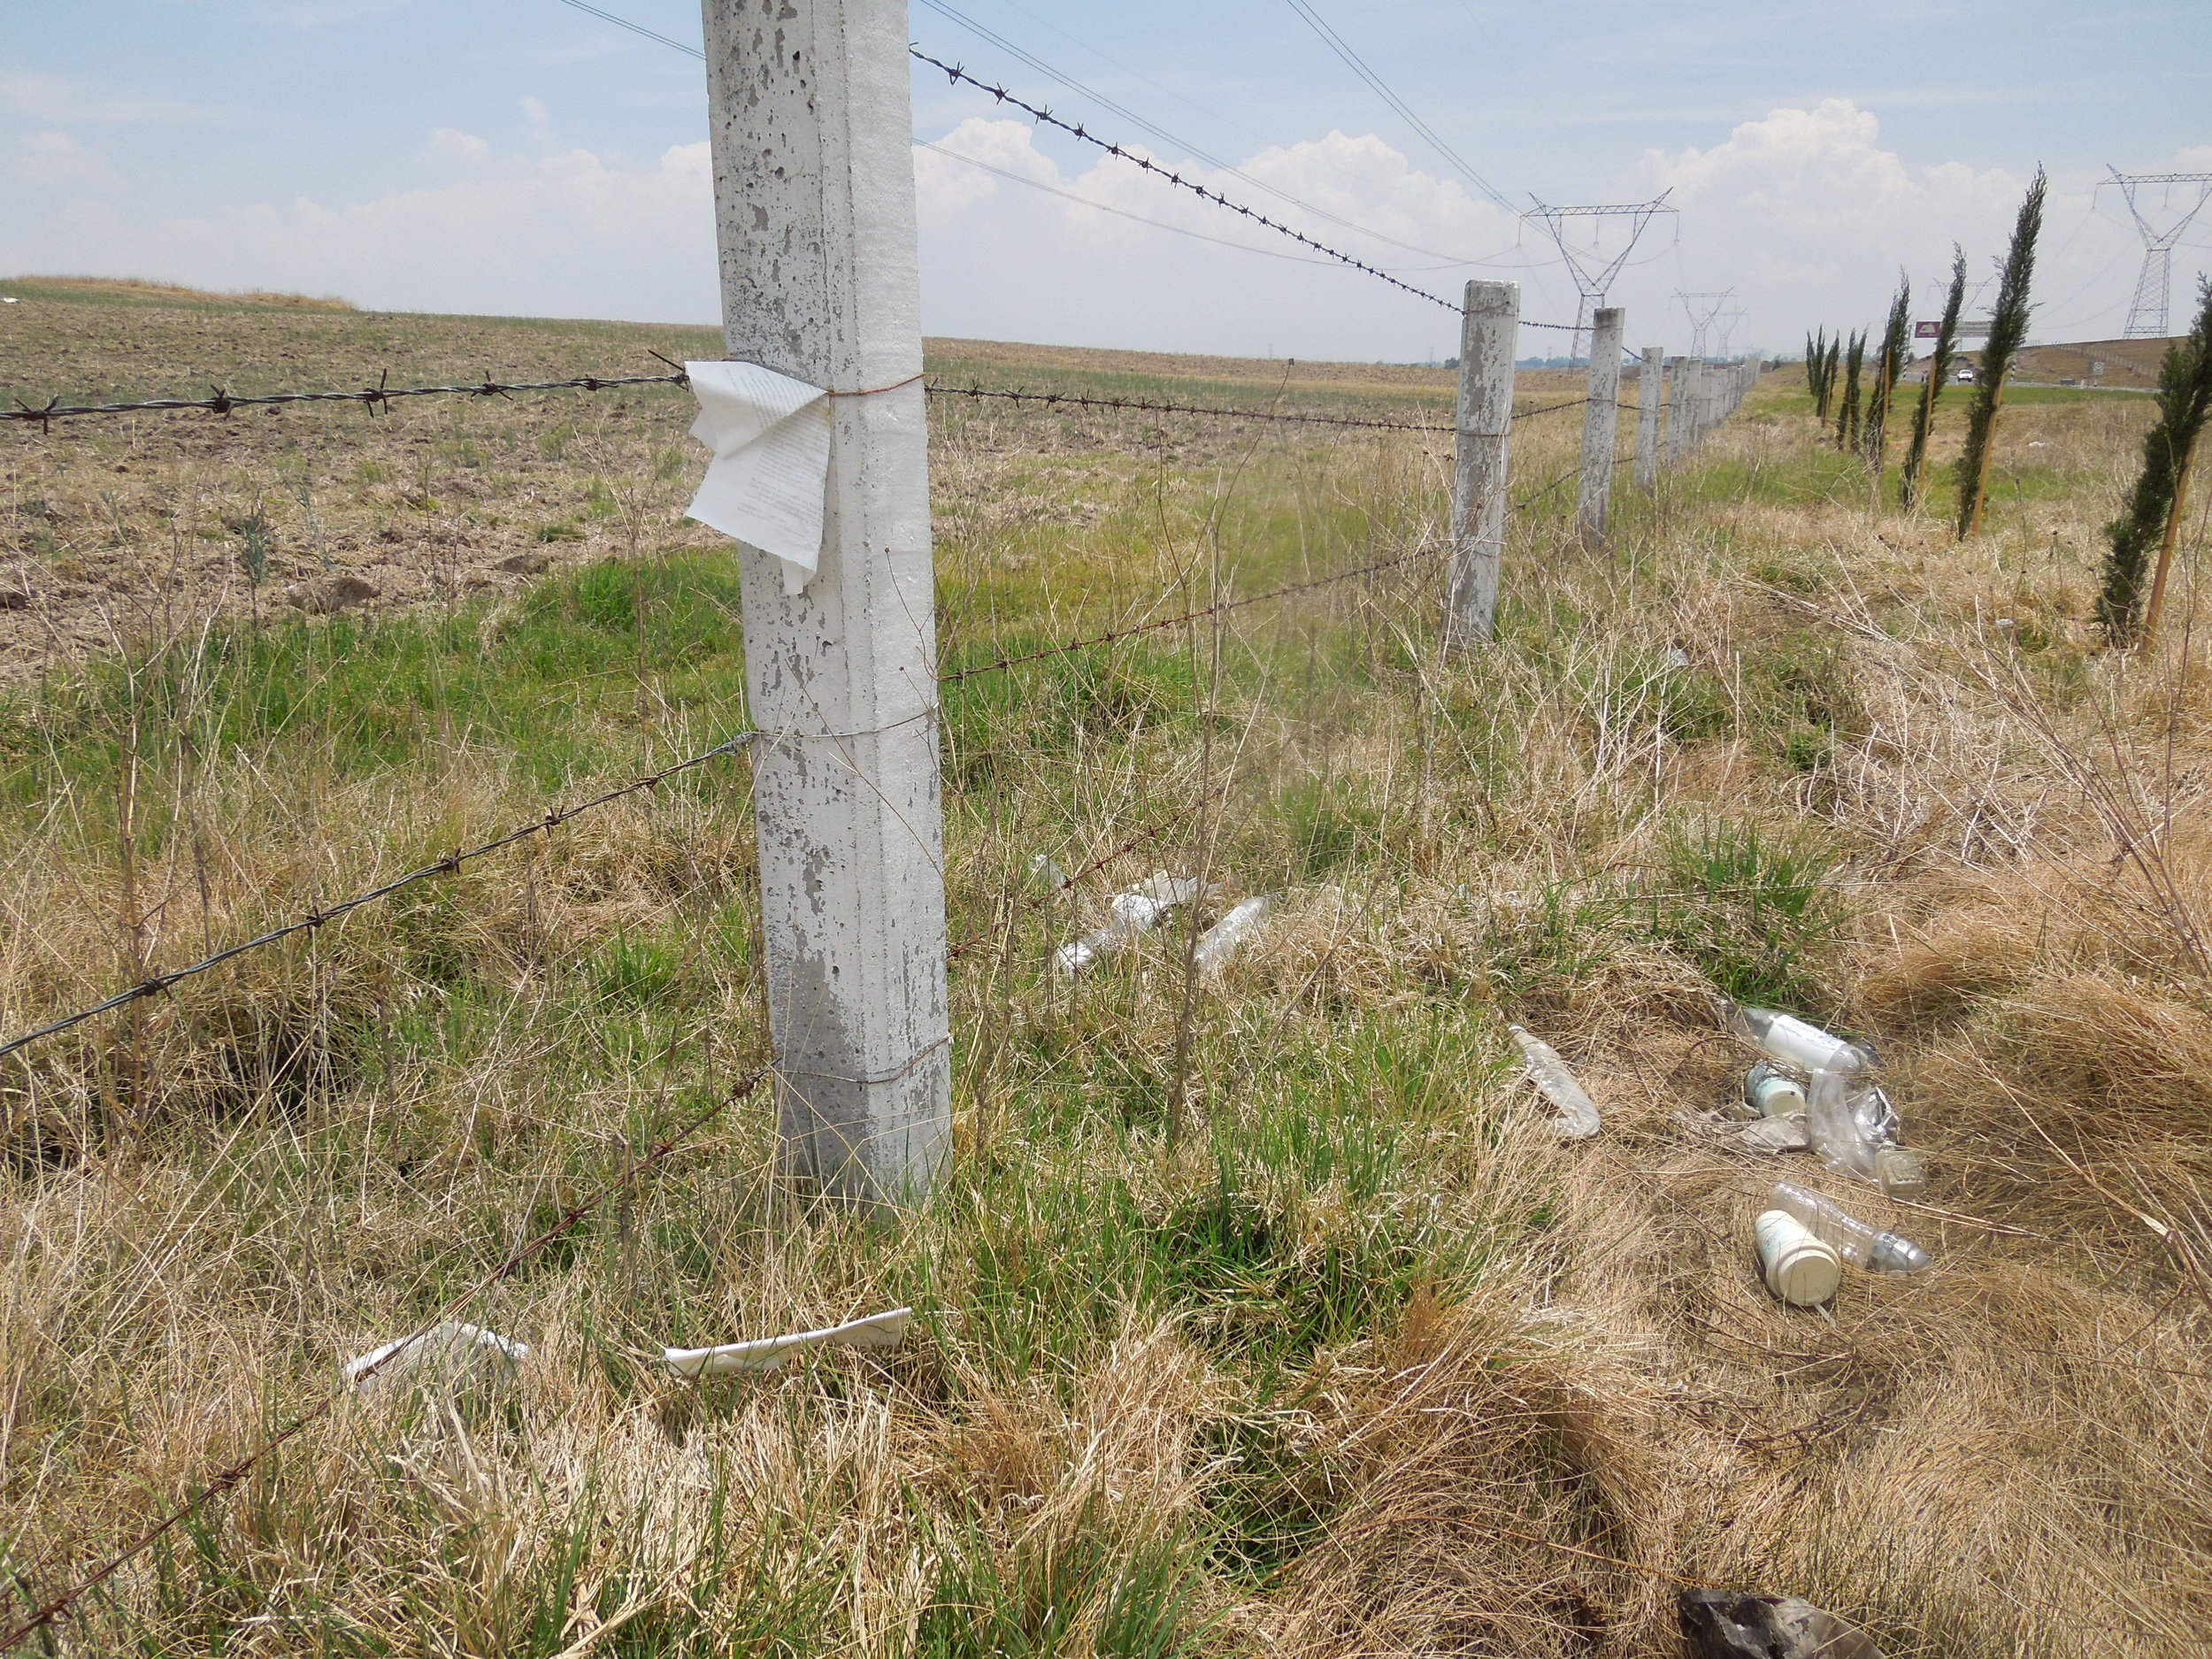 land waste the lucia hinojosa.JPG